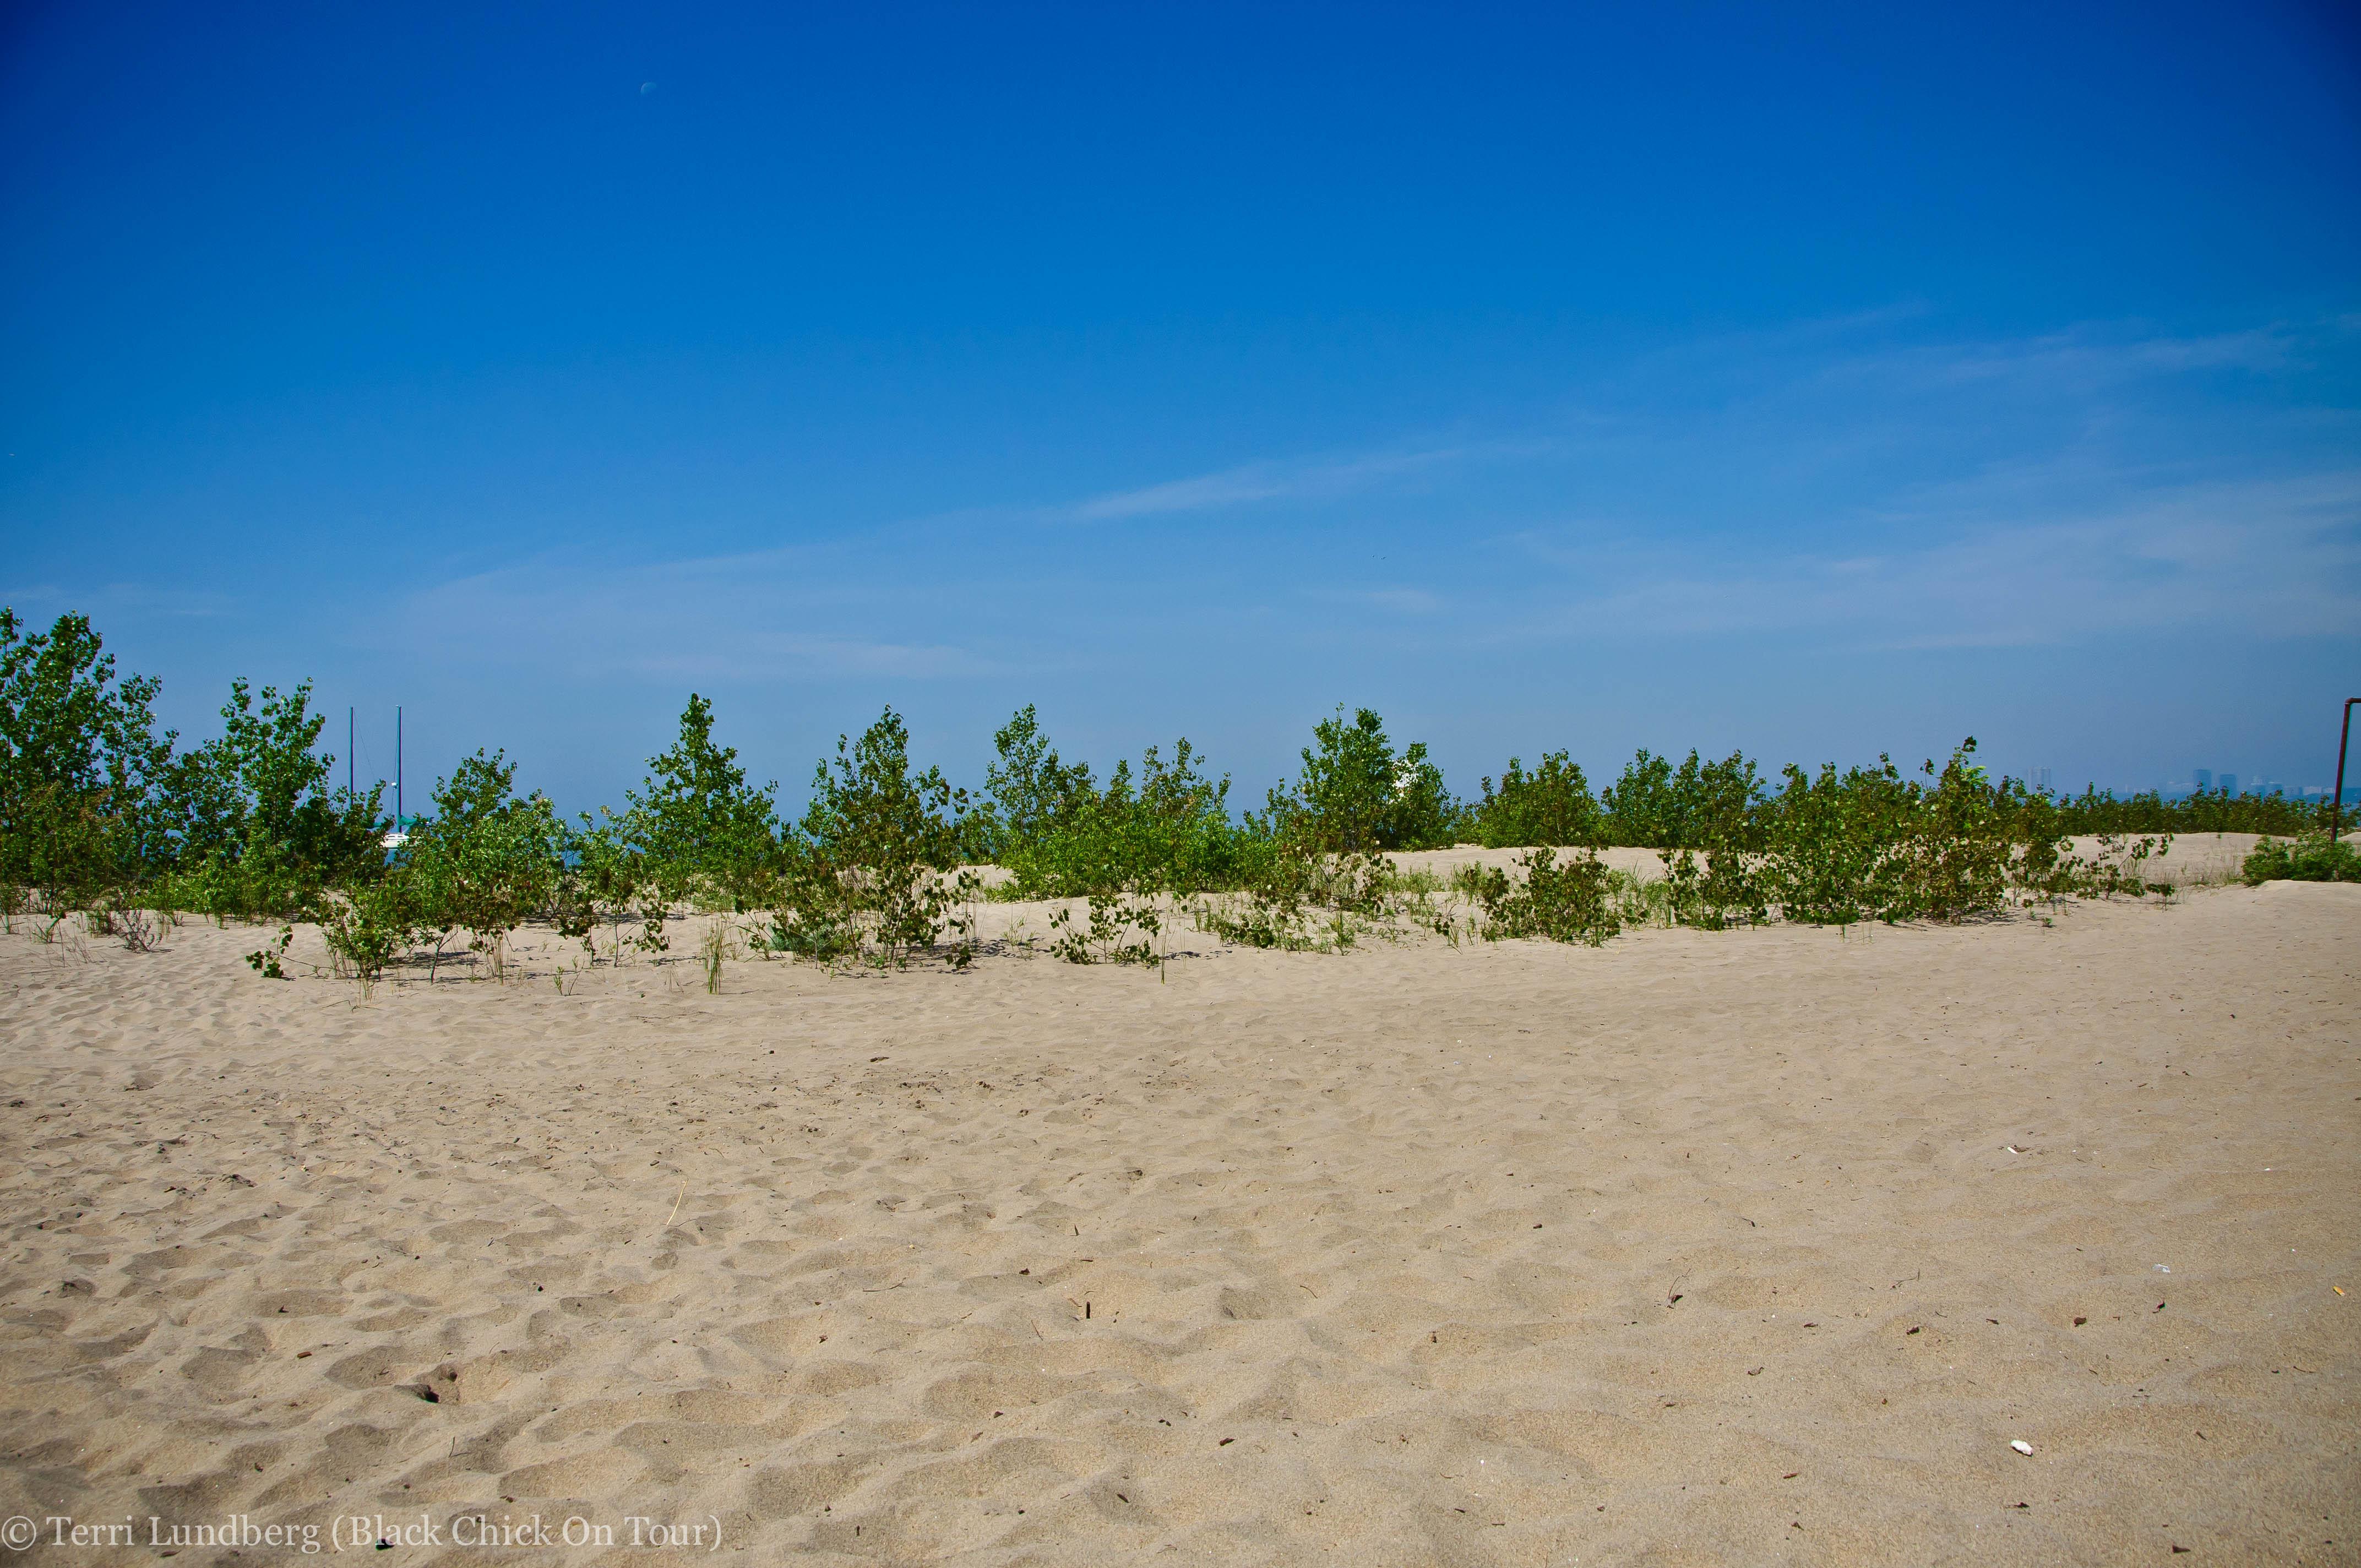 Clothing Optional Beach Clothing optional beach on